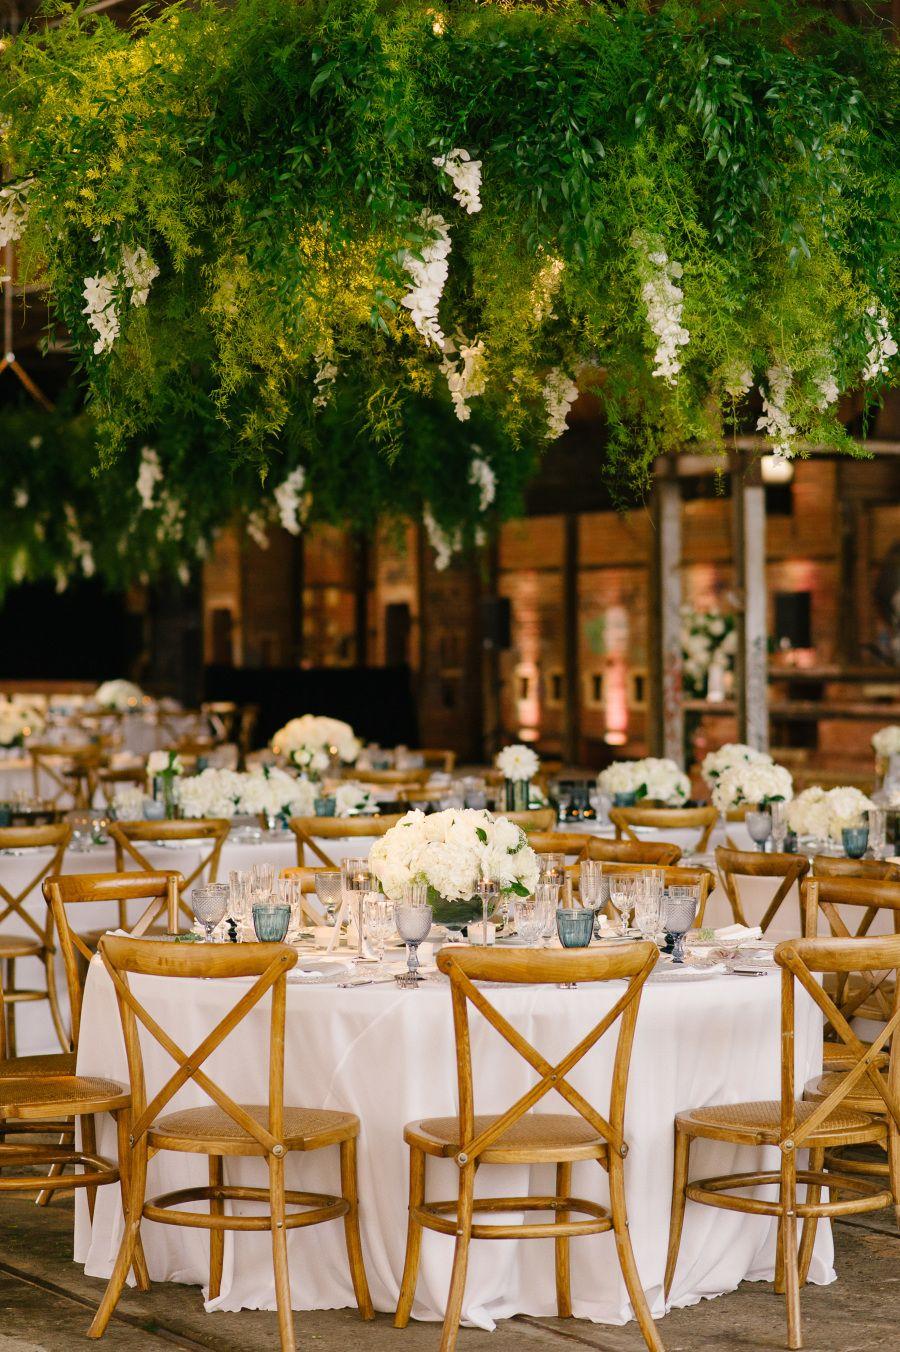 Wedding decorations tent october 2018 Anaheim Ducksu Winger Says